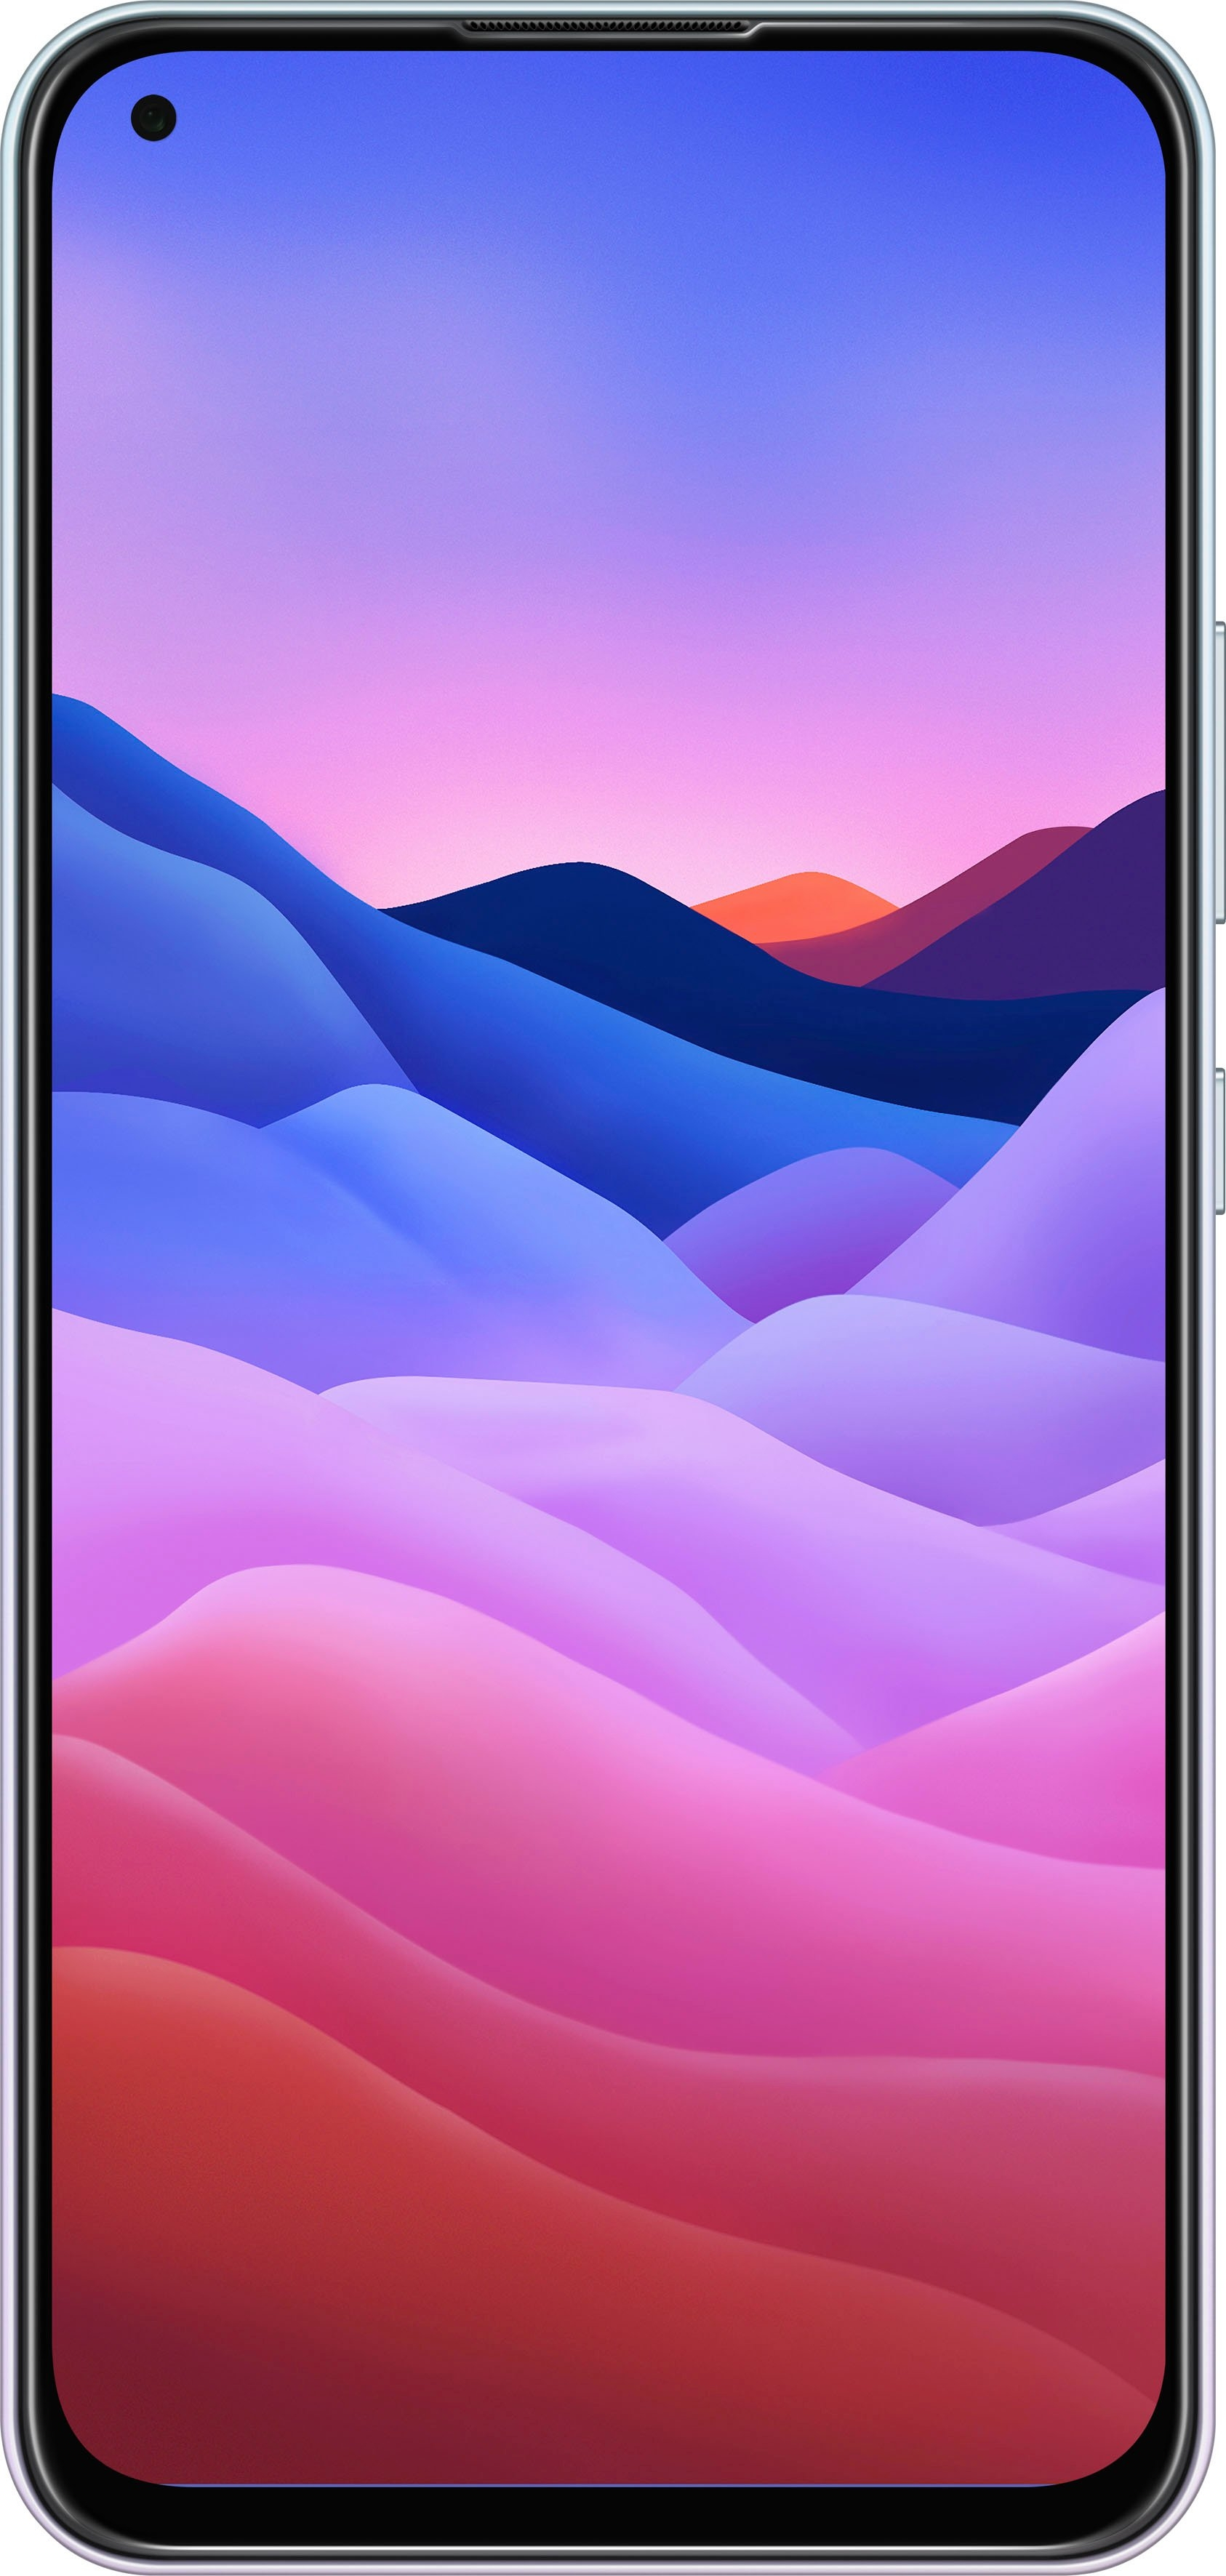 ZTE Blade V 2020 Smartphone (16,6 cm / 6,53 inch, 128 GB, 48 MP camera) online kopen op otto.nl